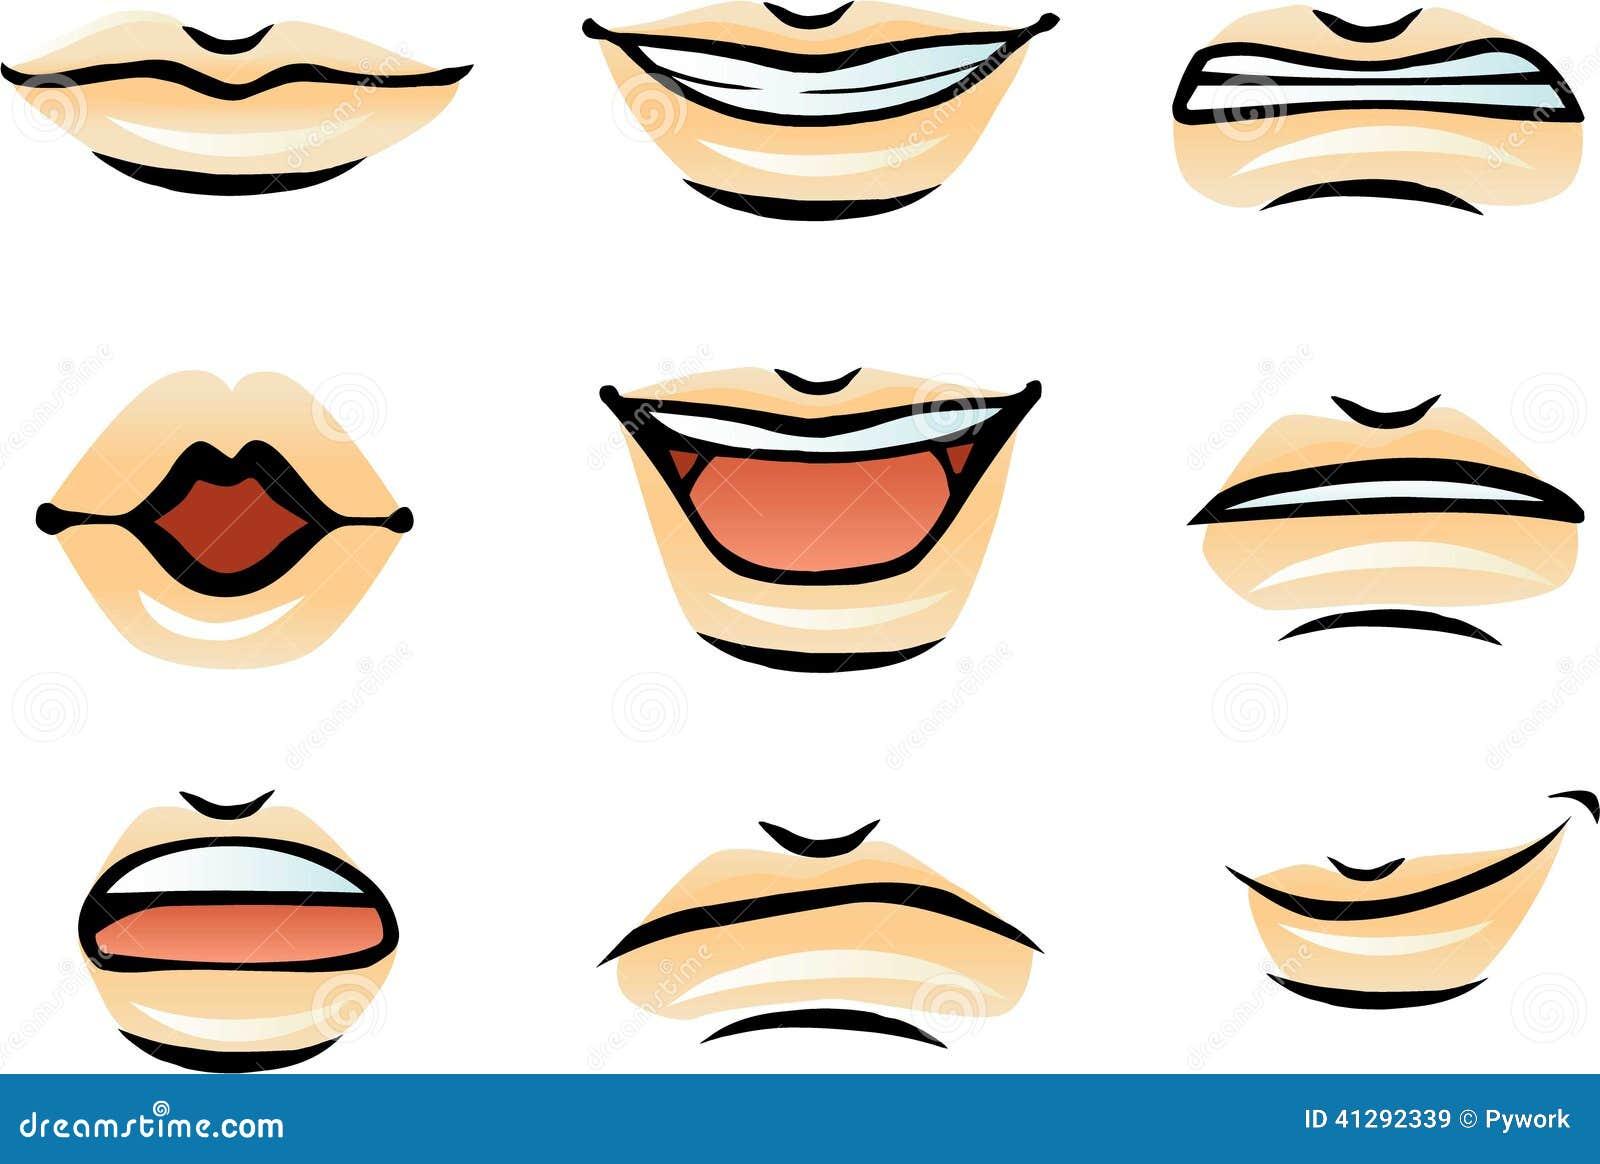 Lips Male Stock Illustrations 5 331 Lips Male Stock Illustrations Vectors Clipart Dreamstime